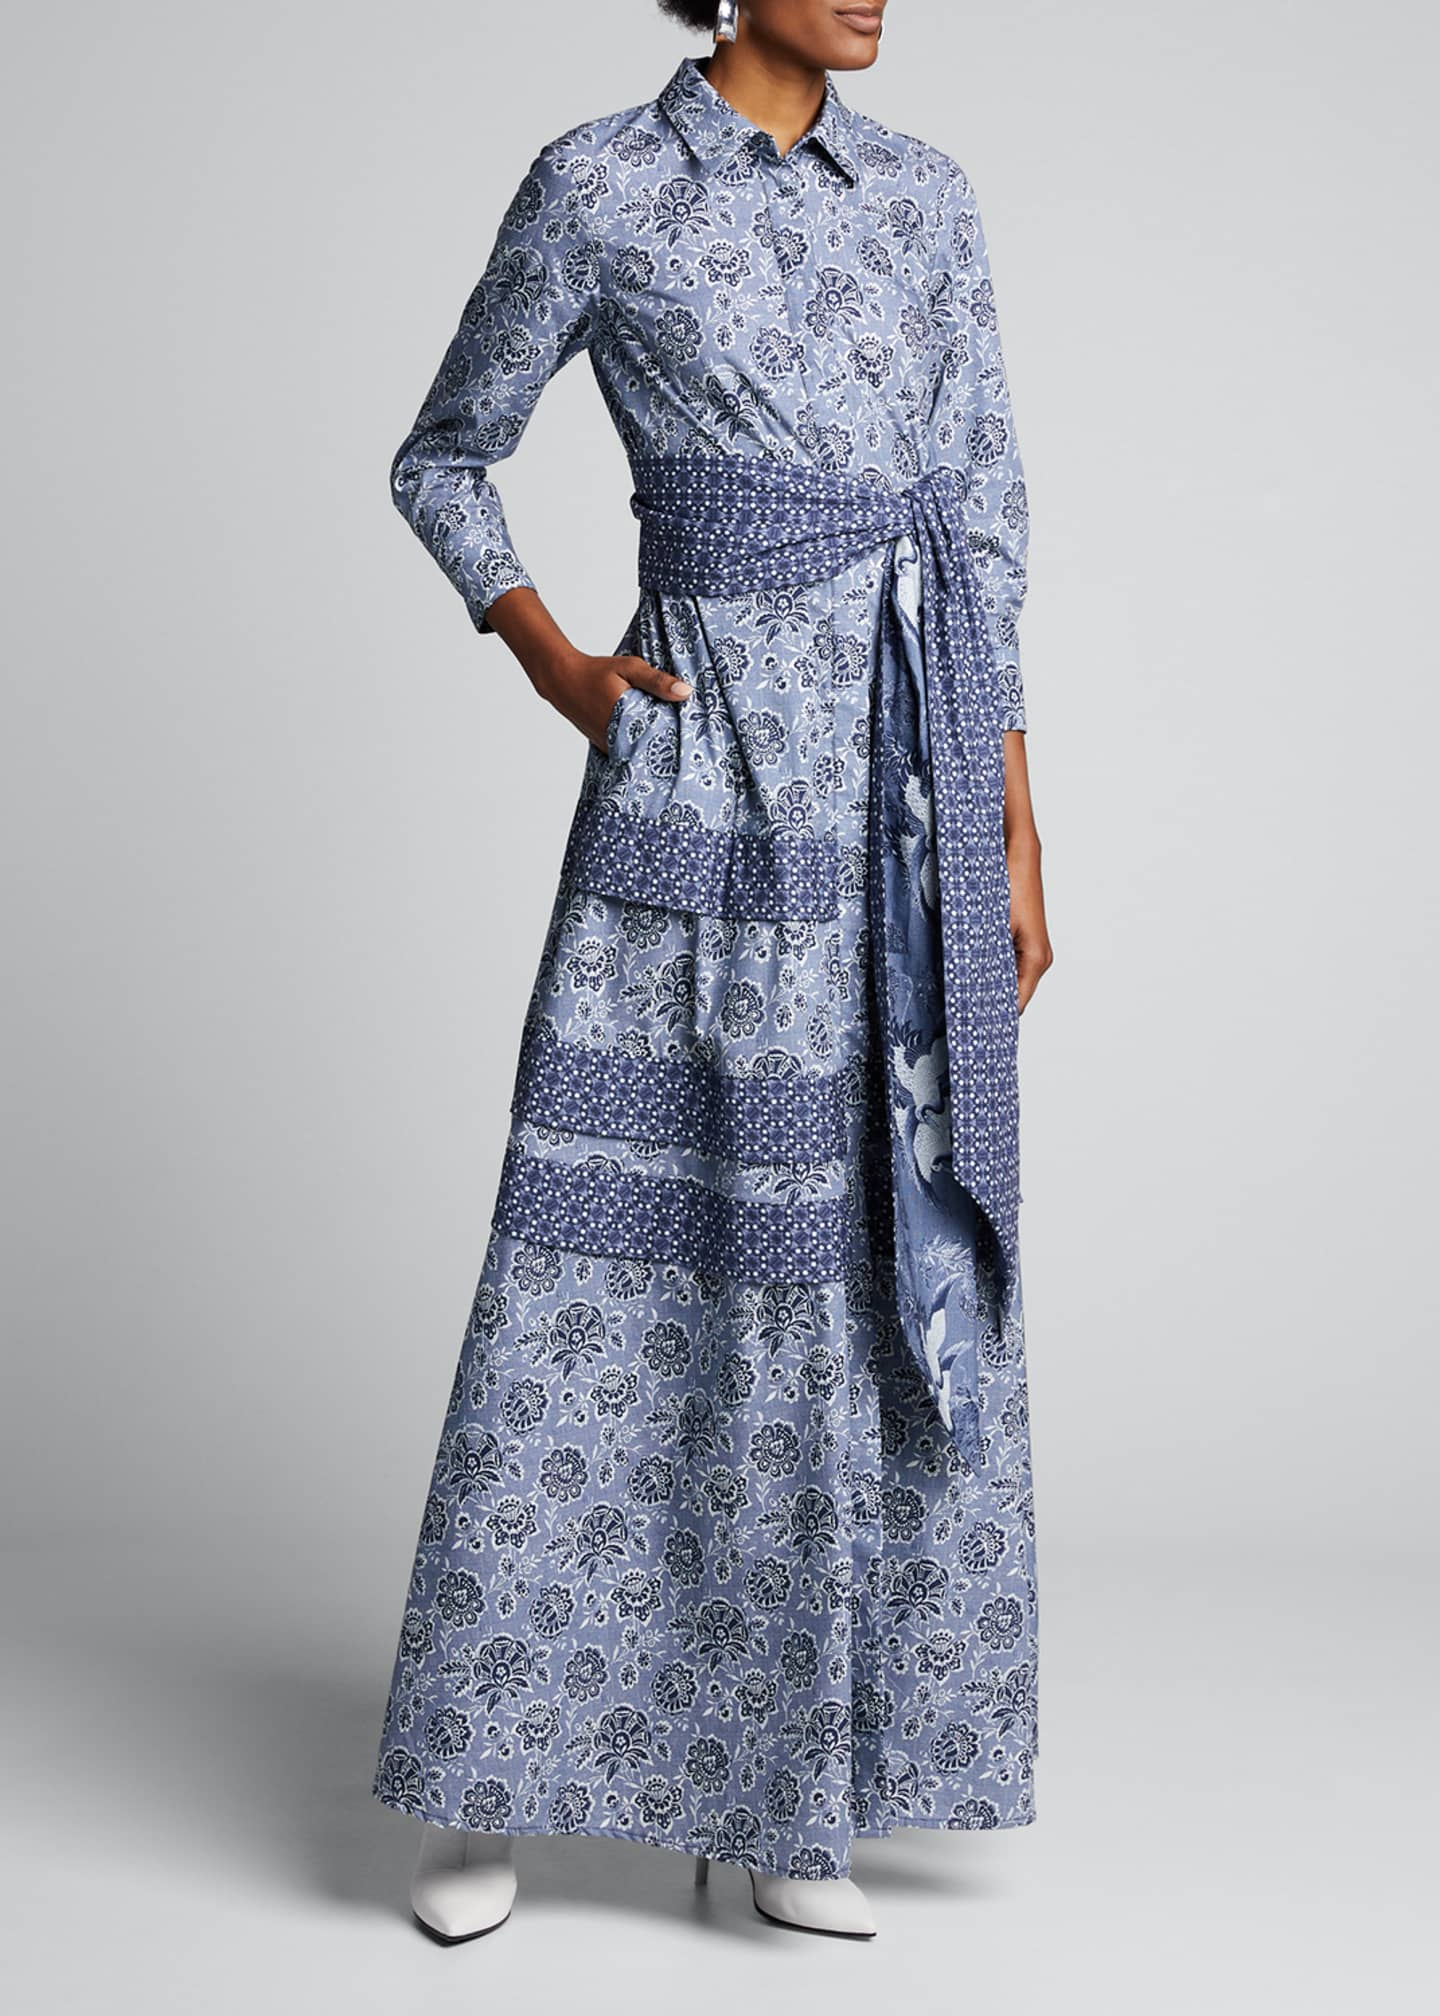 Evi Grintela Menara 3/4-Sleeve Printed Shirtdress